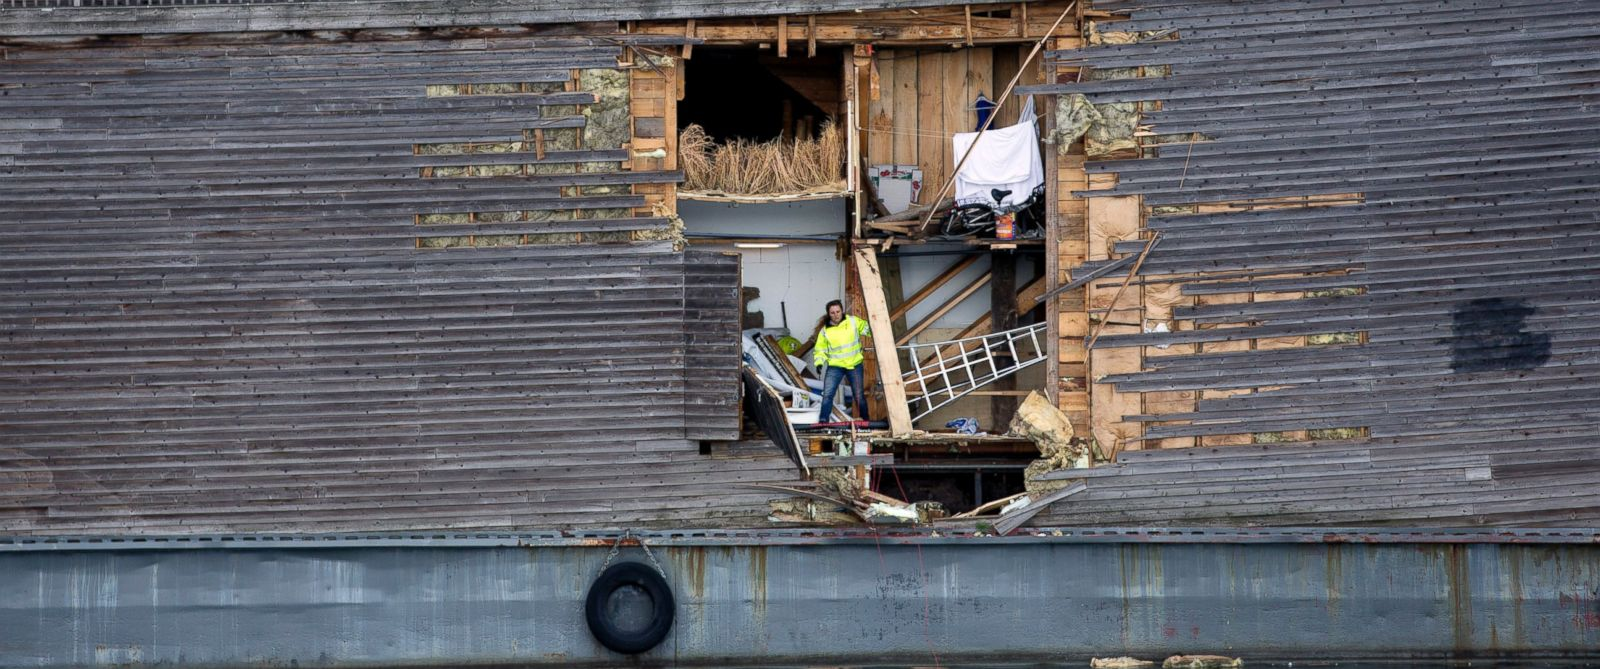 'Noah's Ark' Survives Collision With Norwegian Coast Guard ...